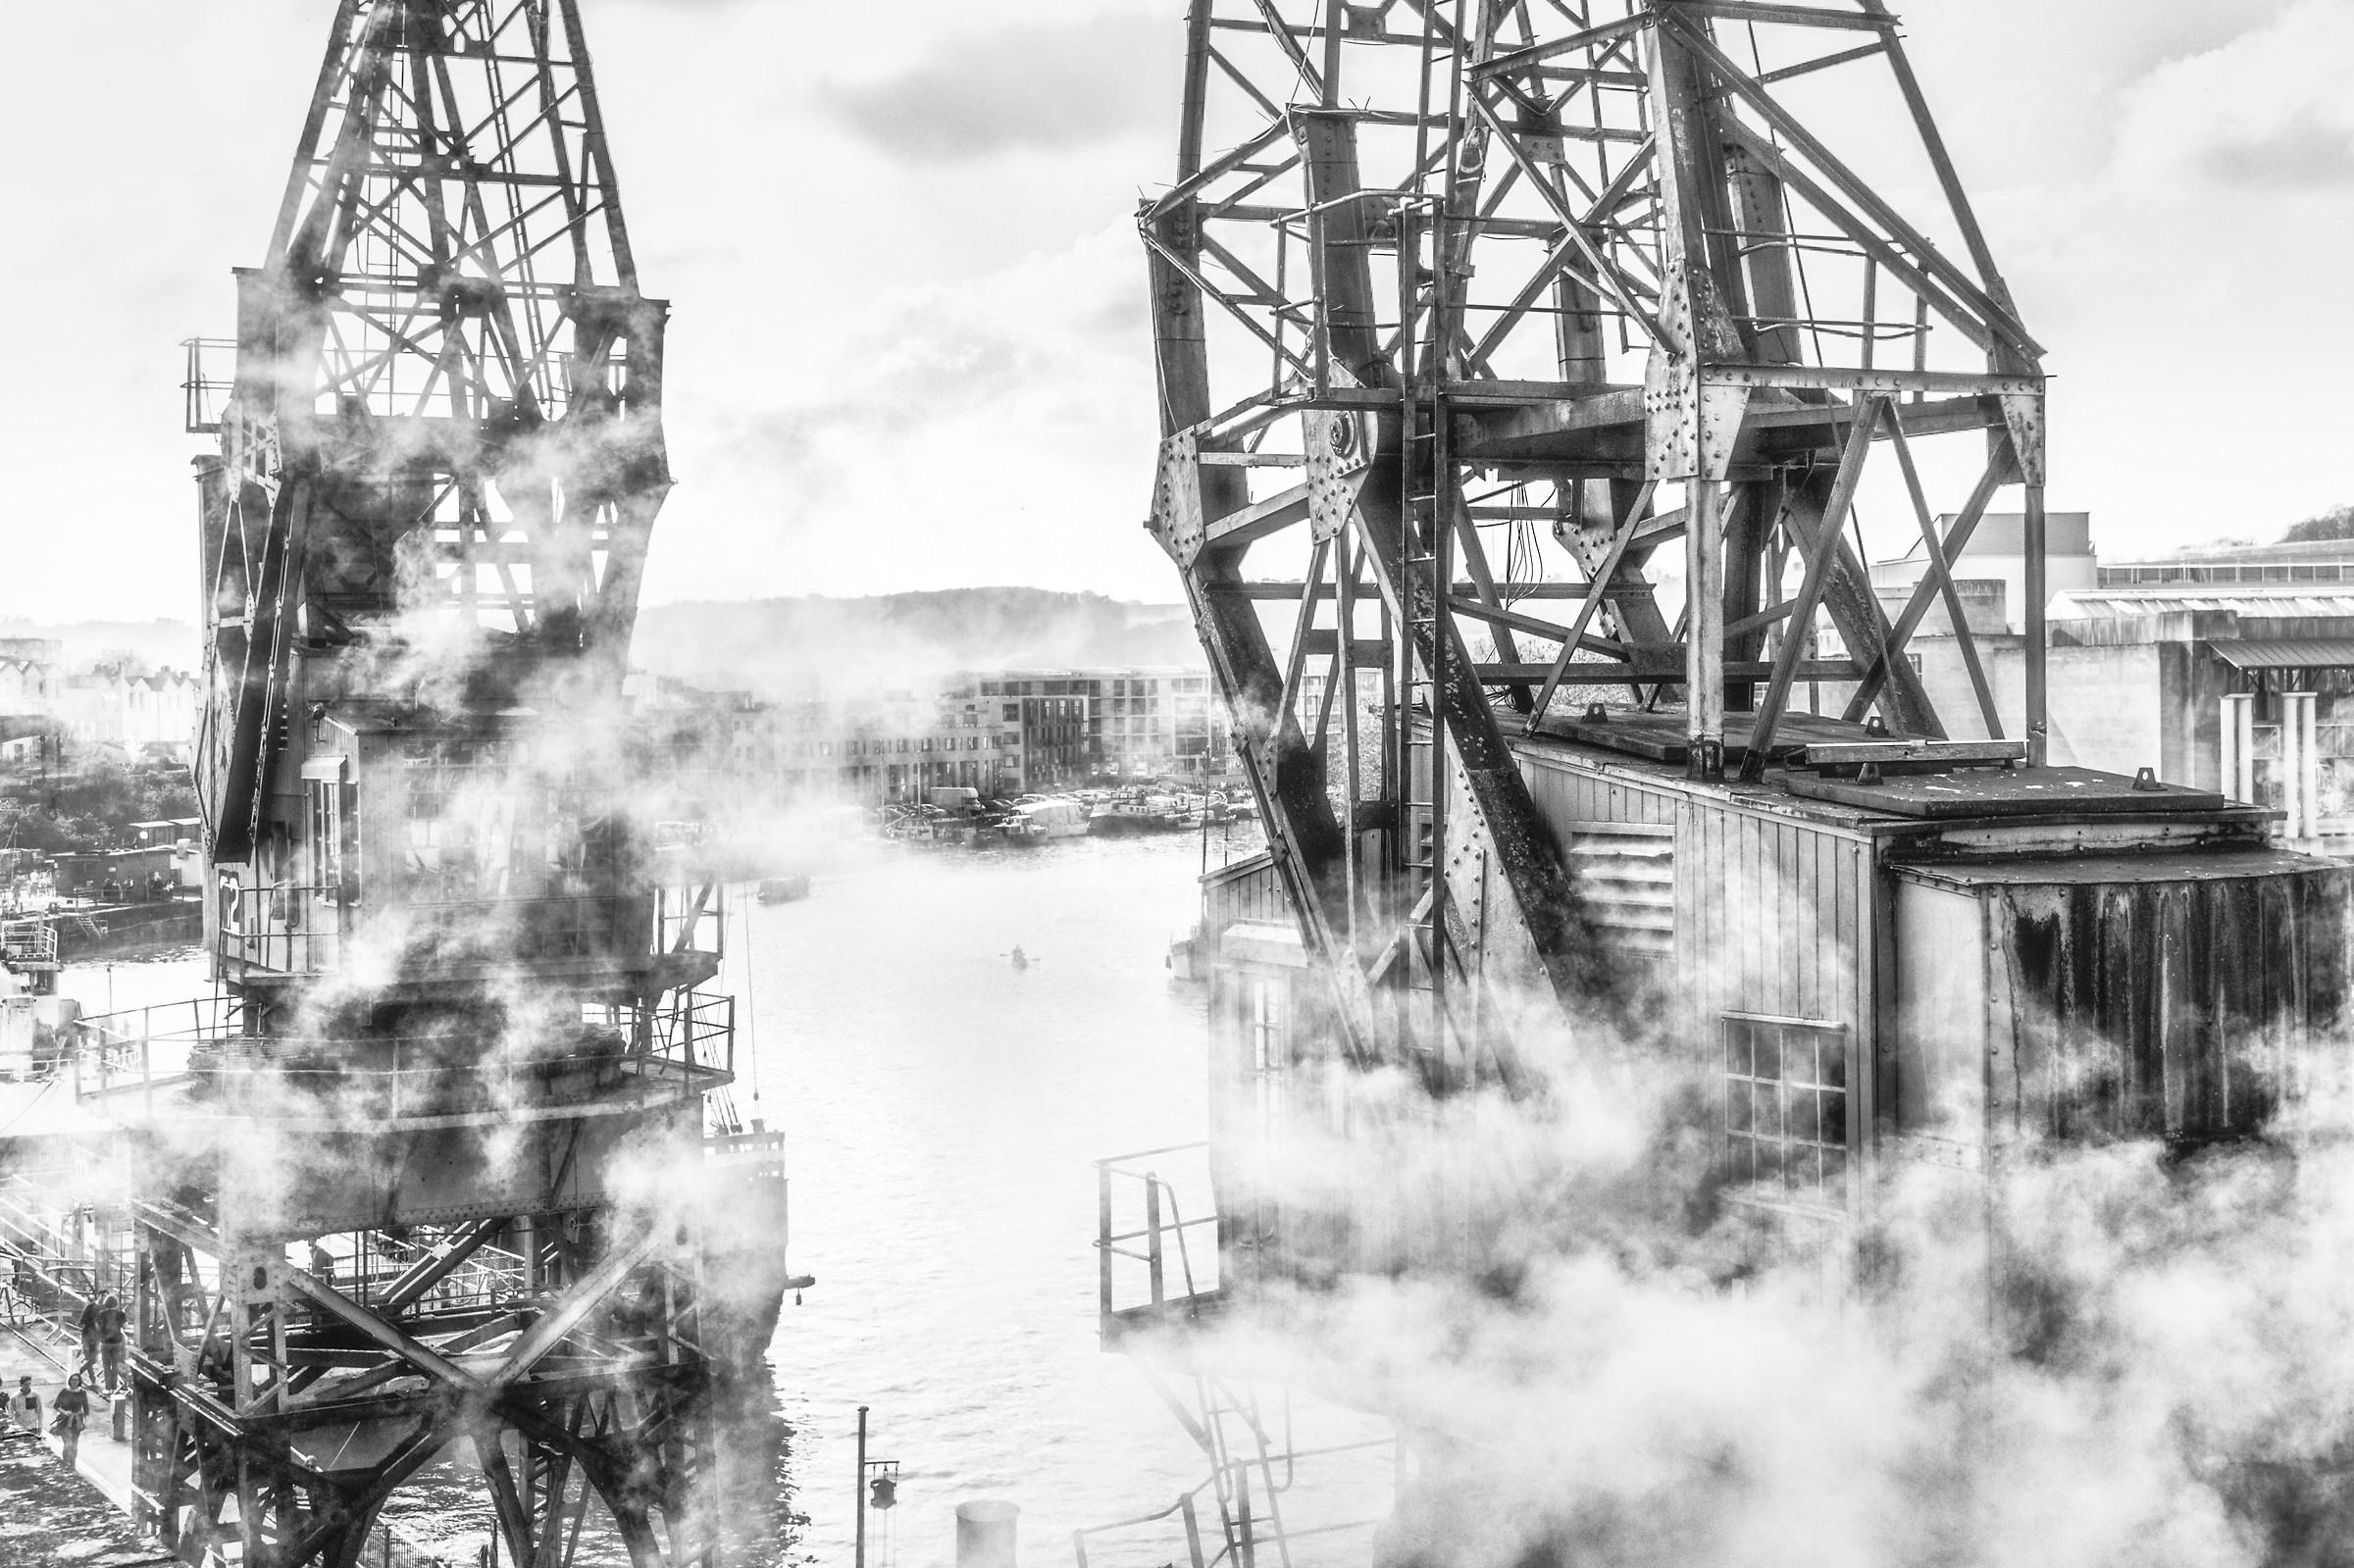 A Steamy Harbourside...